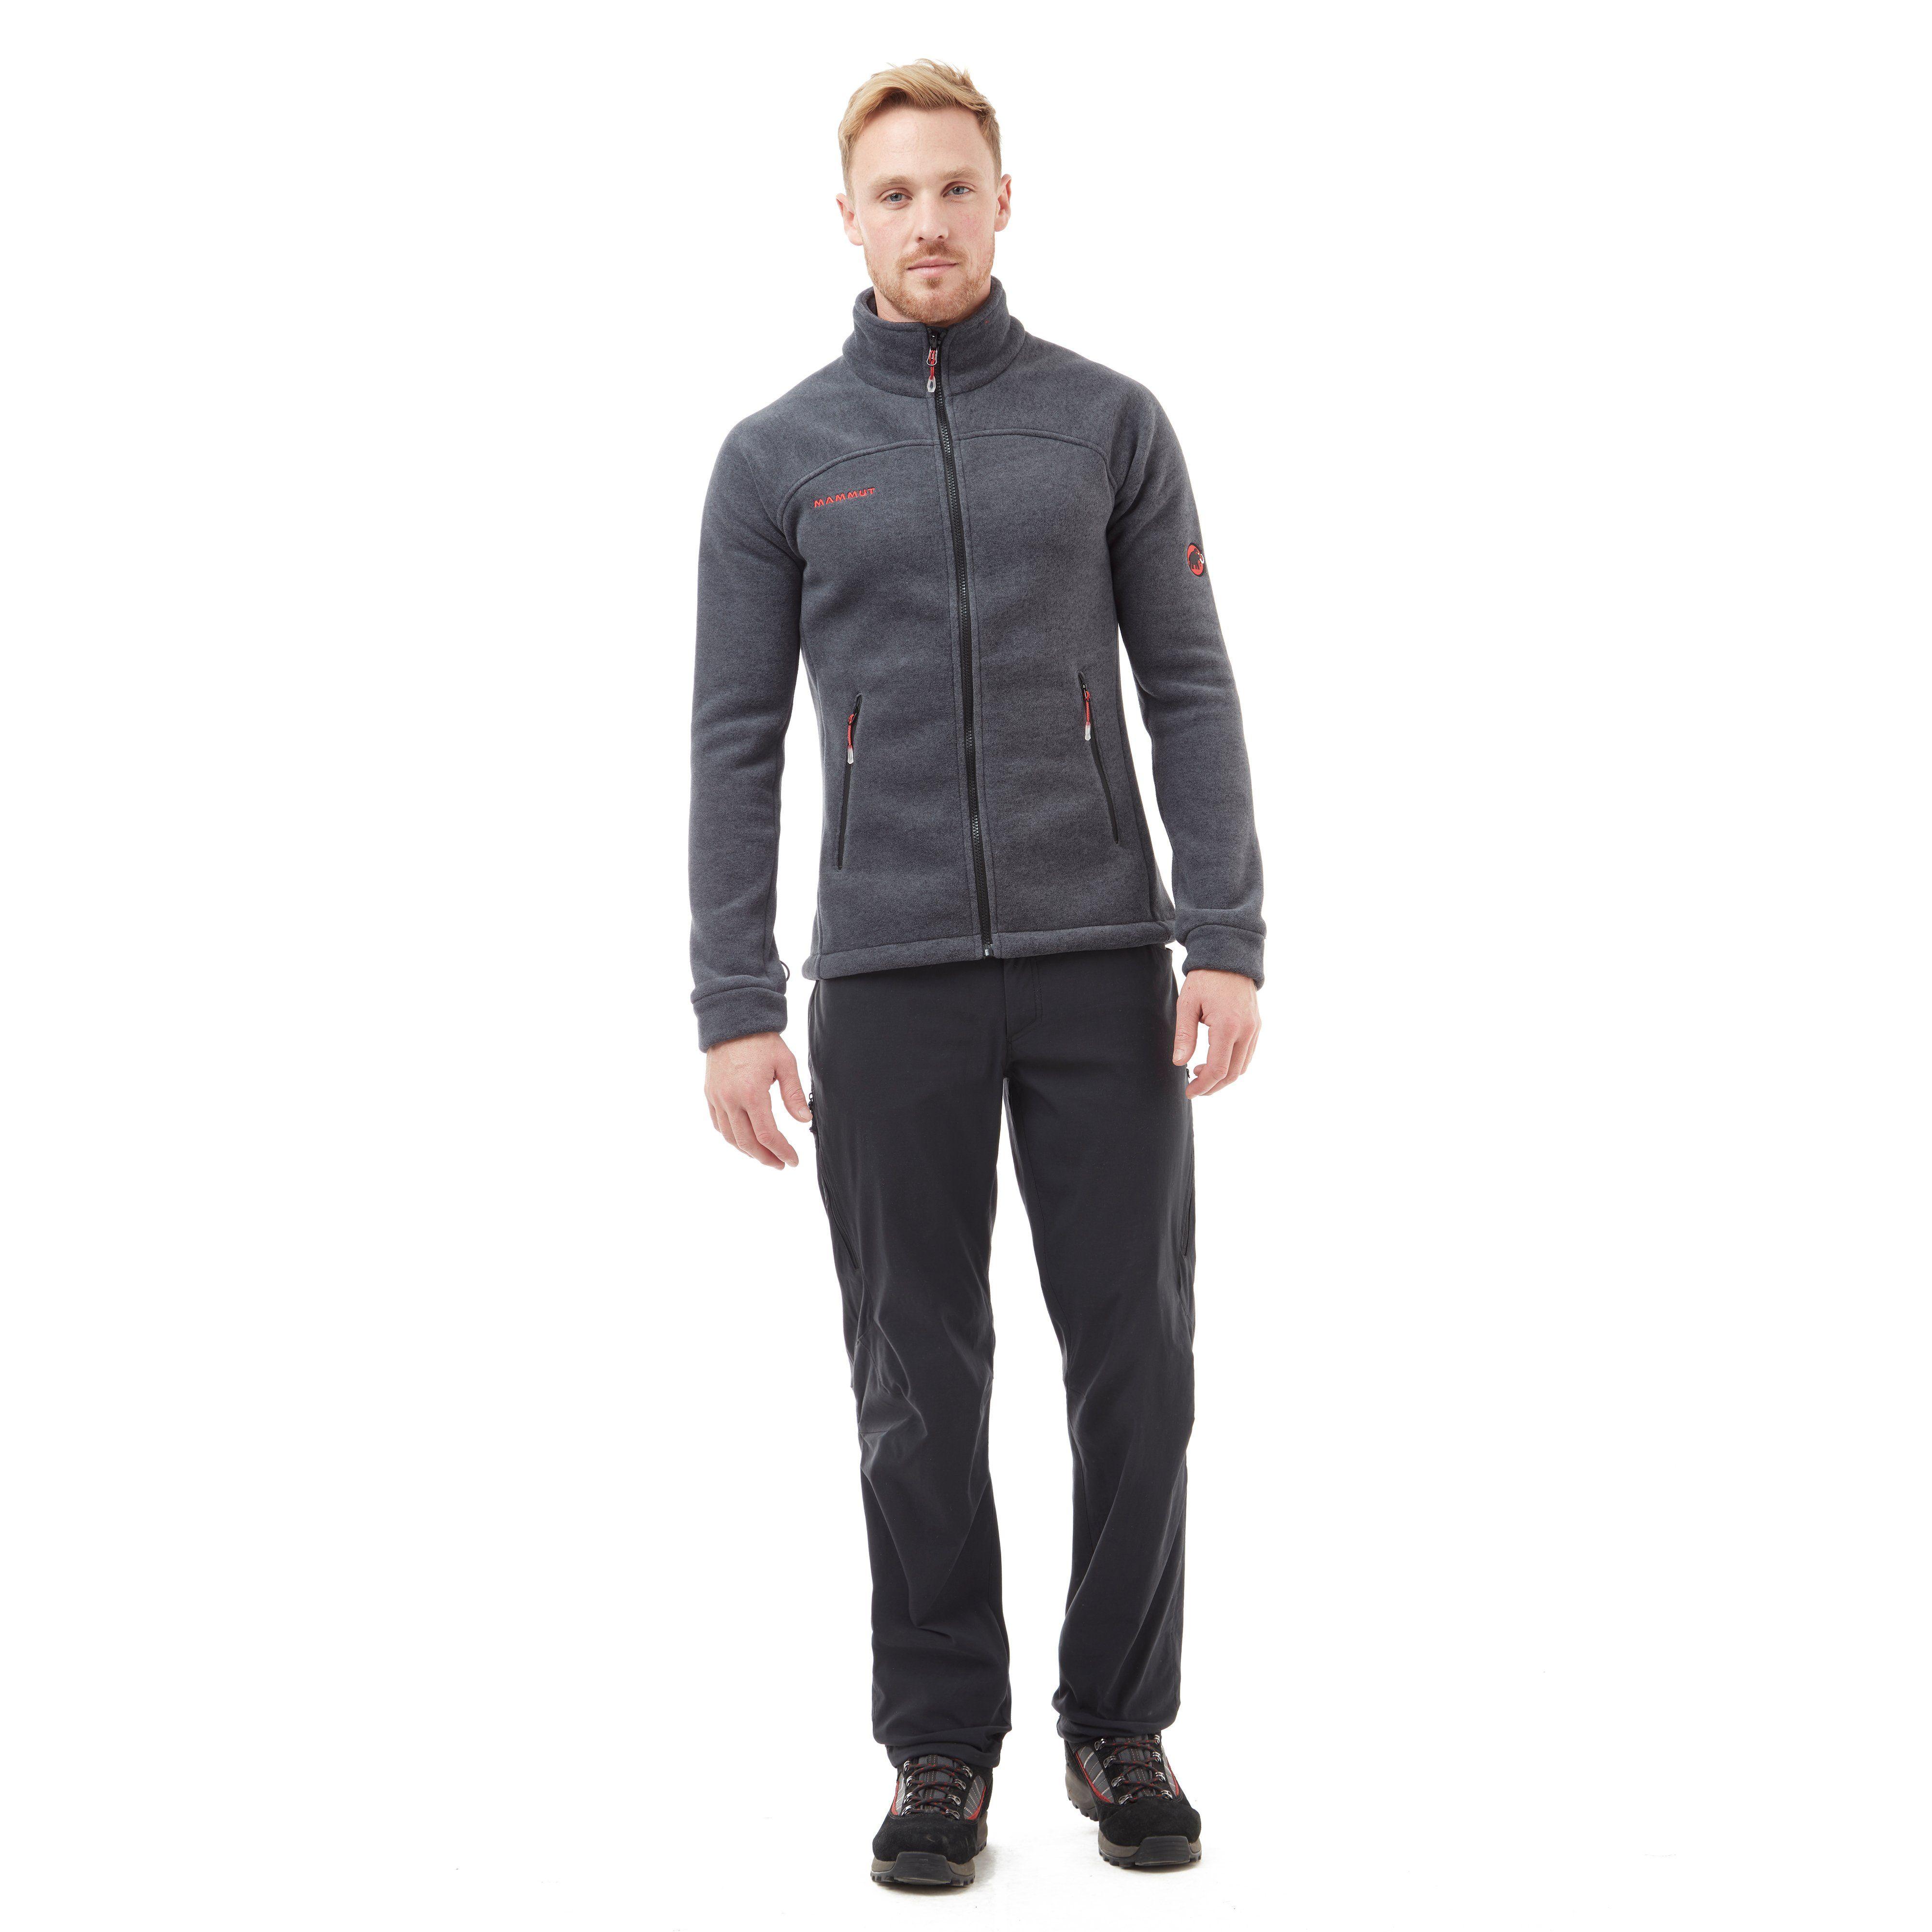 Mammut Innominata Advanced Midlayer Men's Fleece Jacket